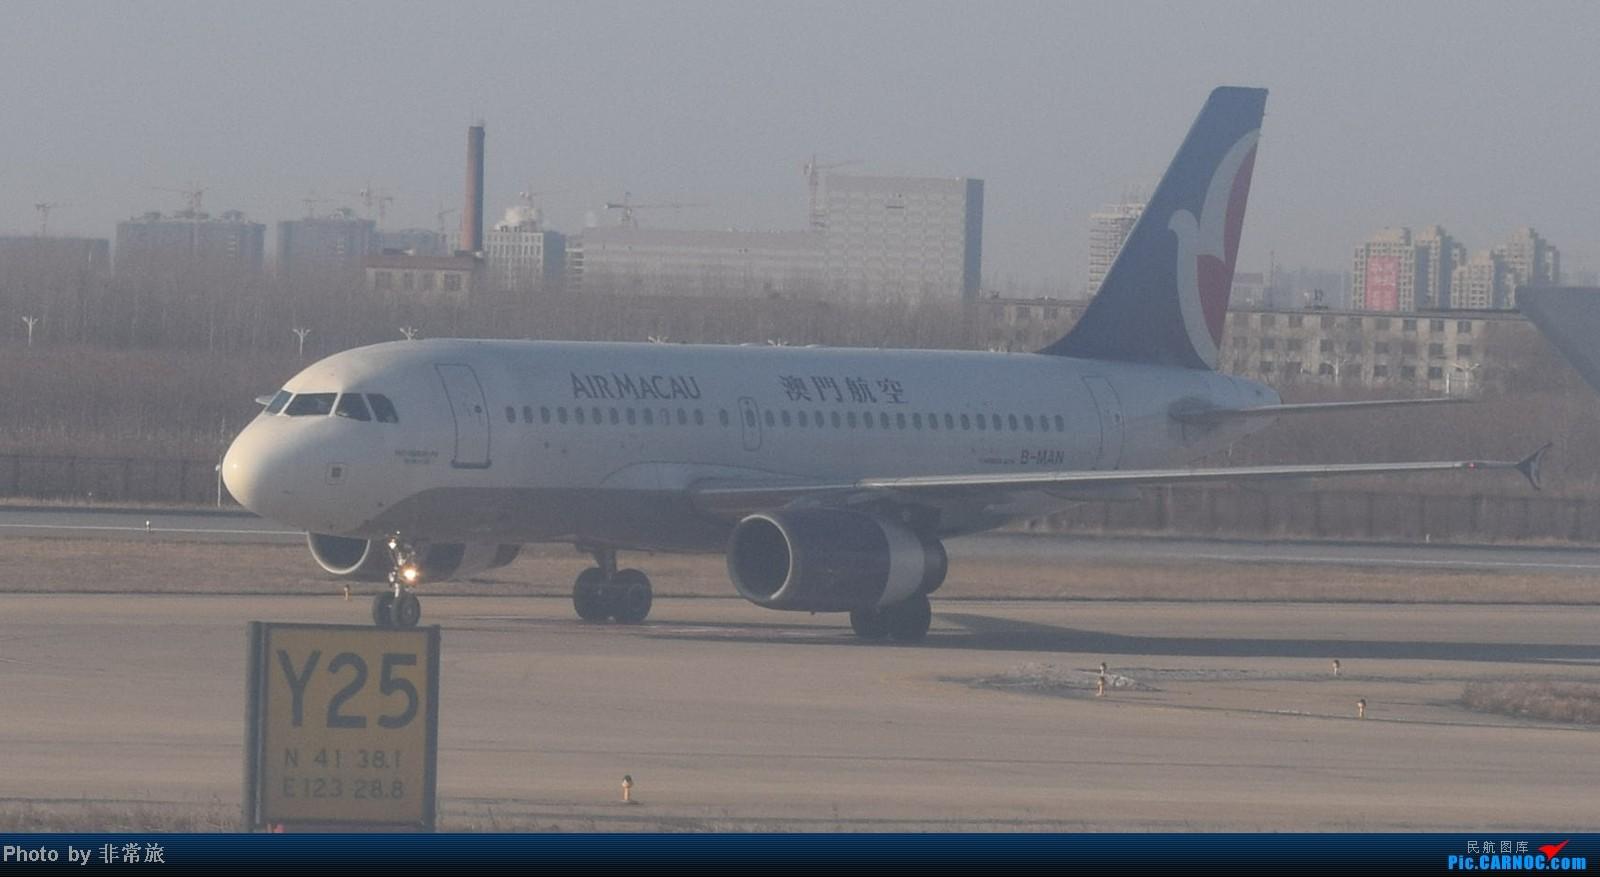 Re:[原创]大年三十除夕夜,三万英尺云霄间。 AIRBUS A319-100 B-MAN 中国沈阳桃仙机场